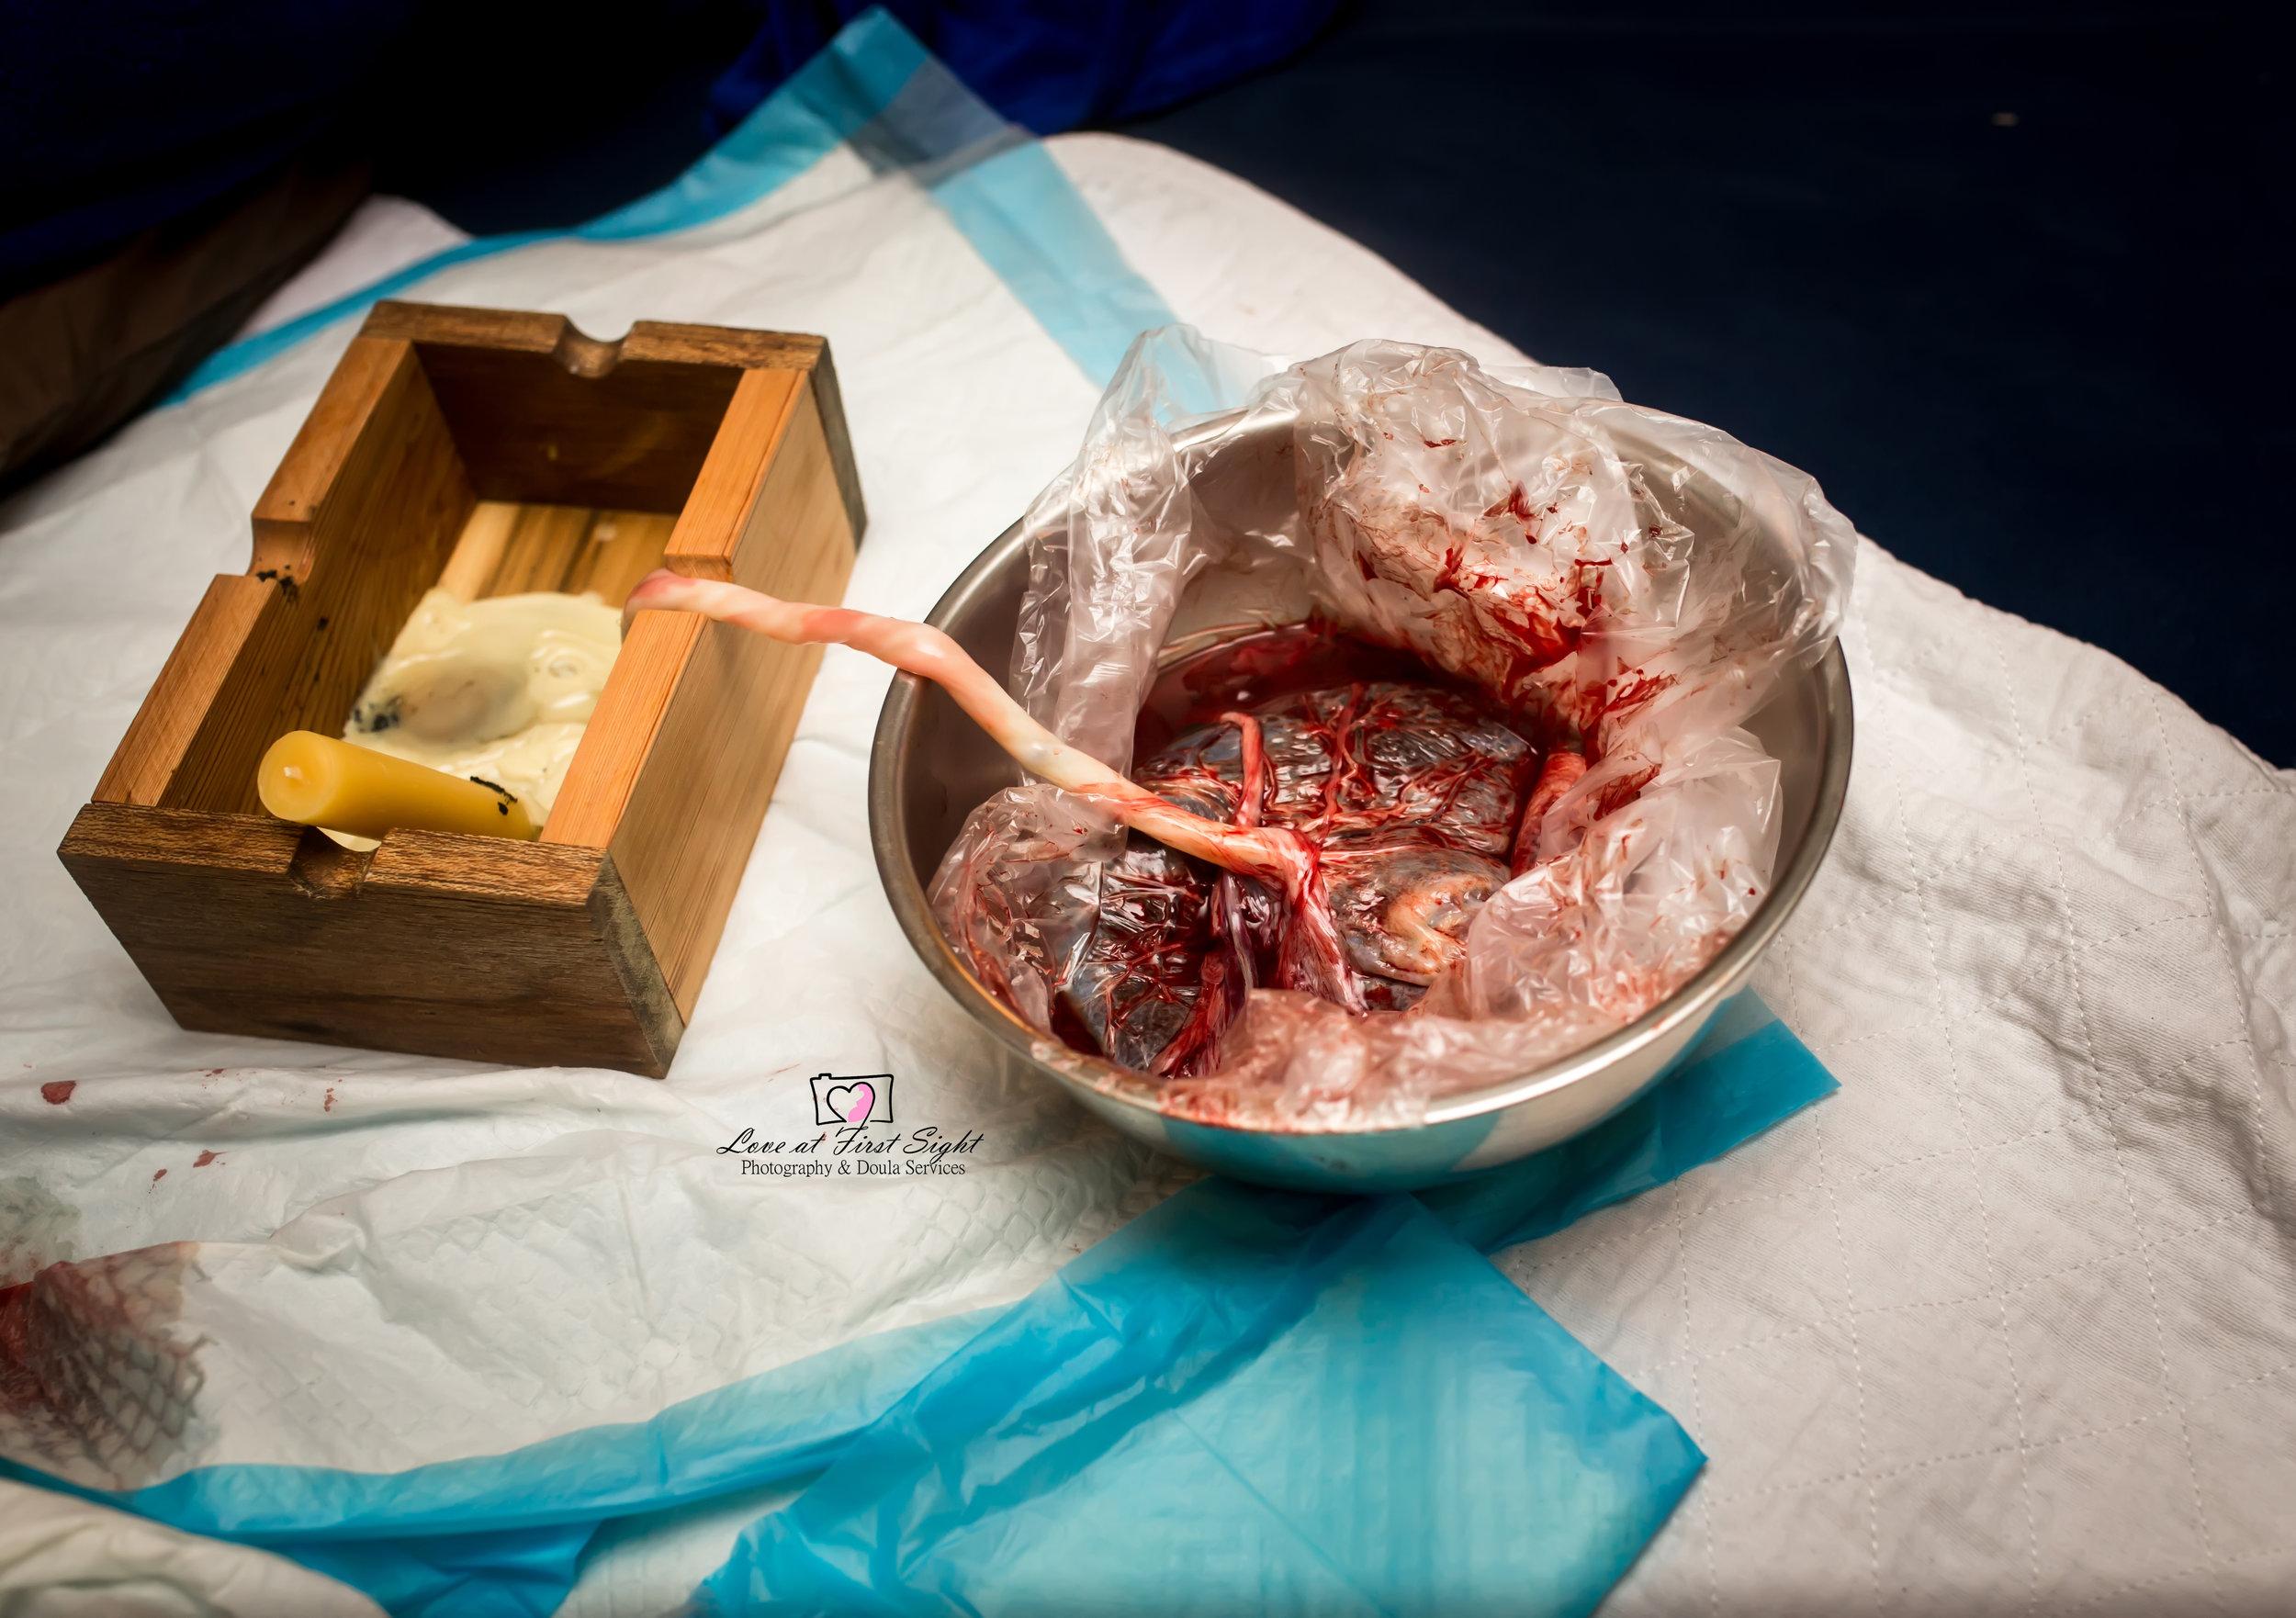 Placenta-Encapsolation-For-Burlington-North-Carolina-Tree-Of-Life-Birth-Collective-By-Kristian-Jordan